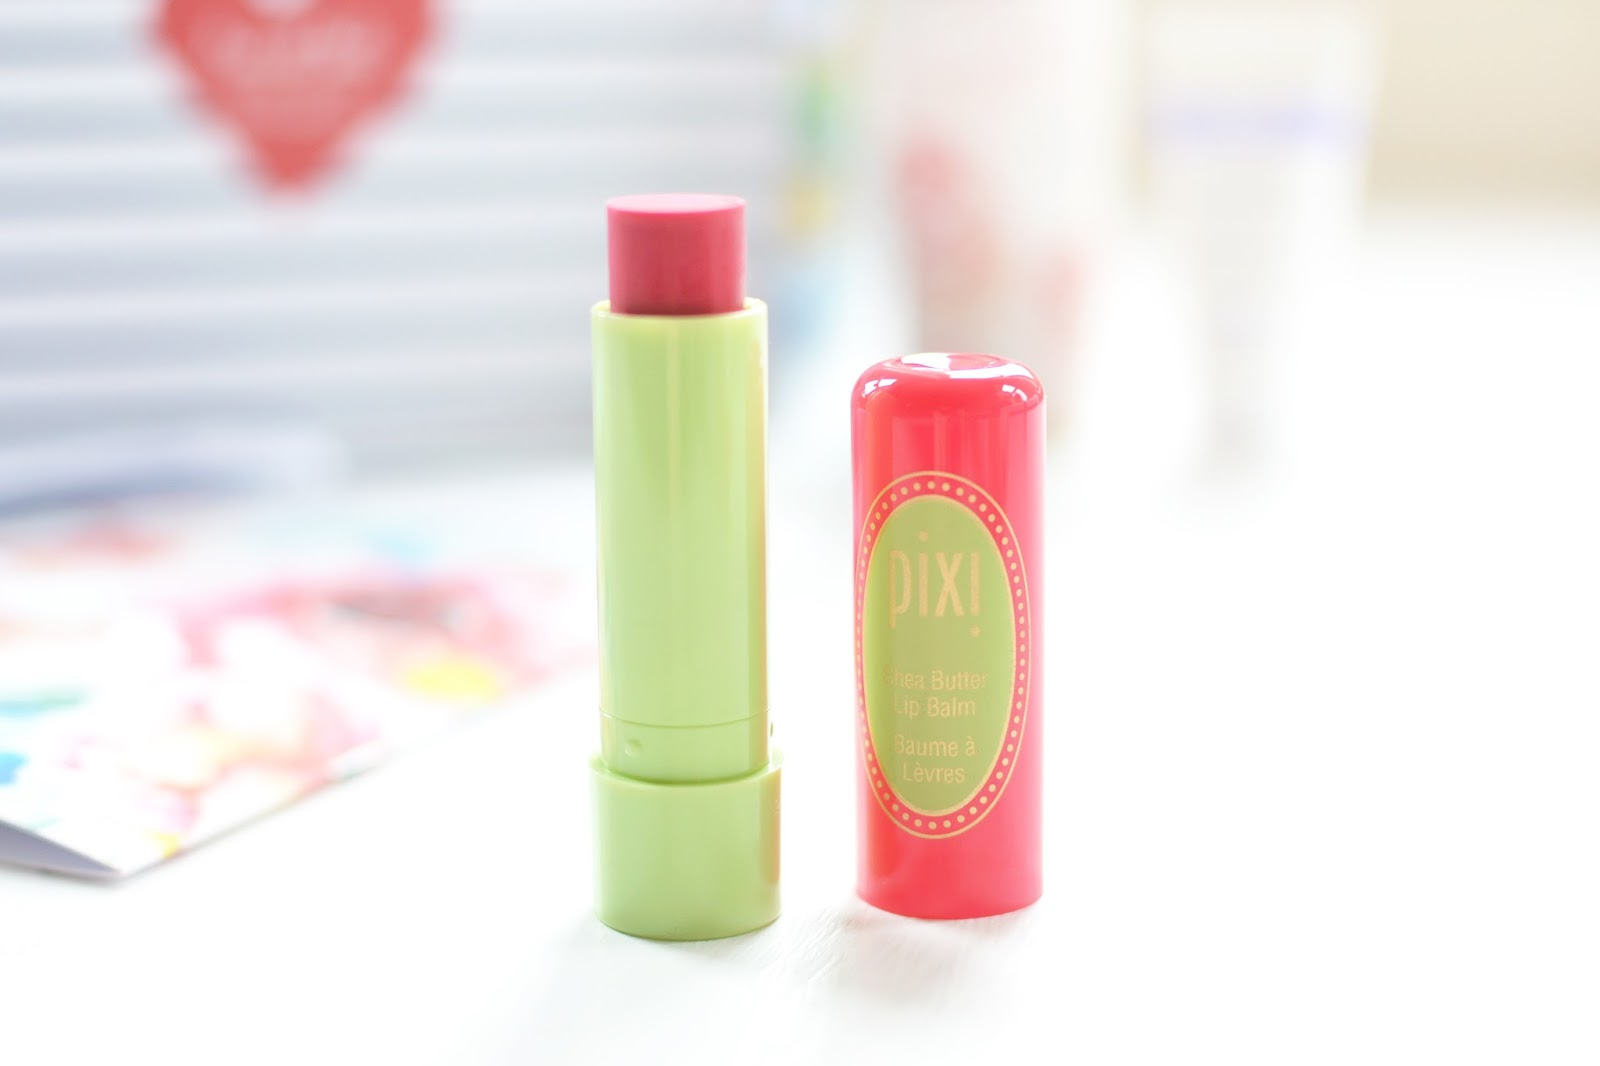 pixi ripe raspberry lip balm